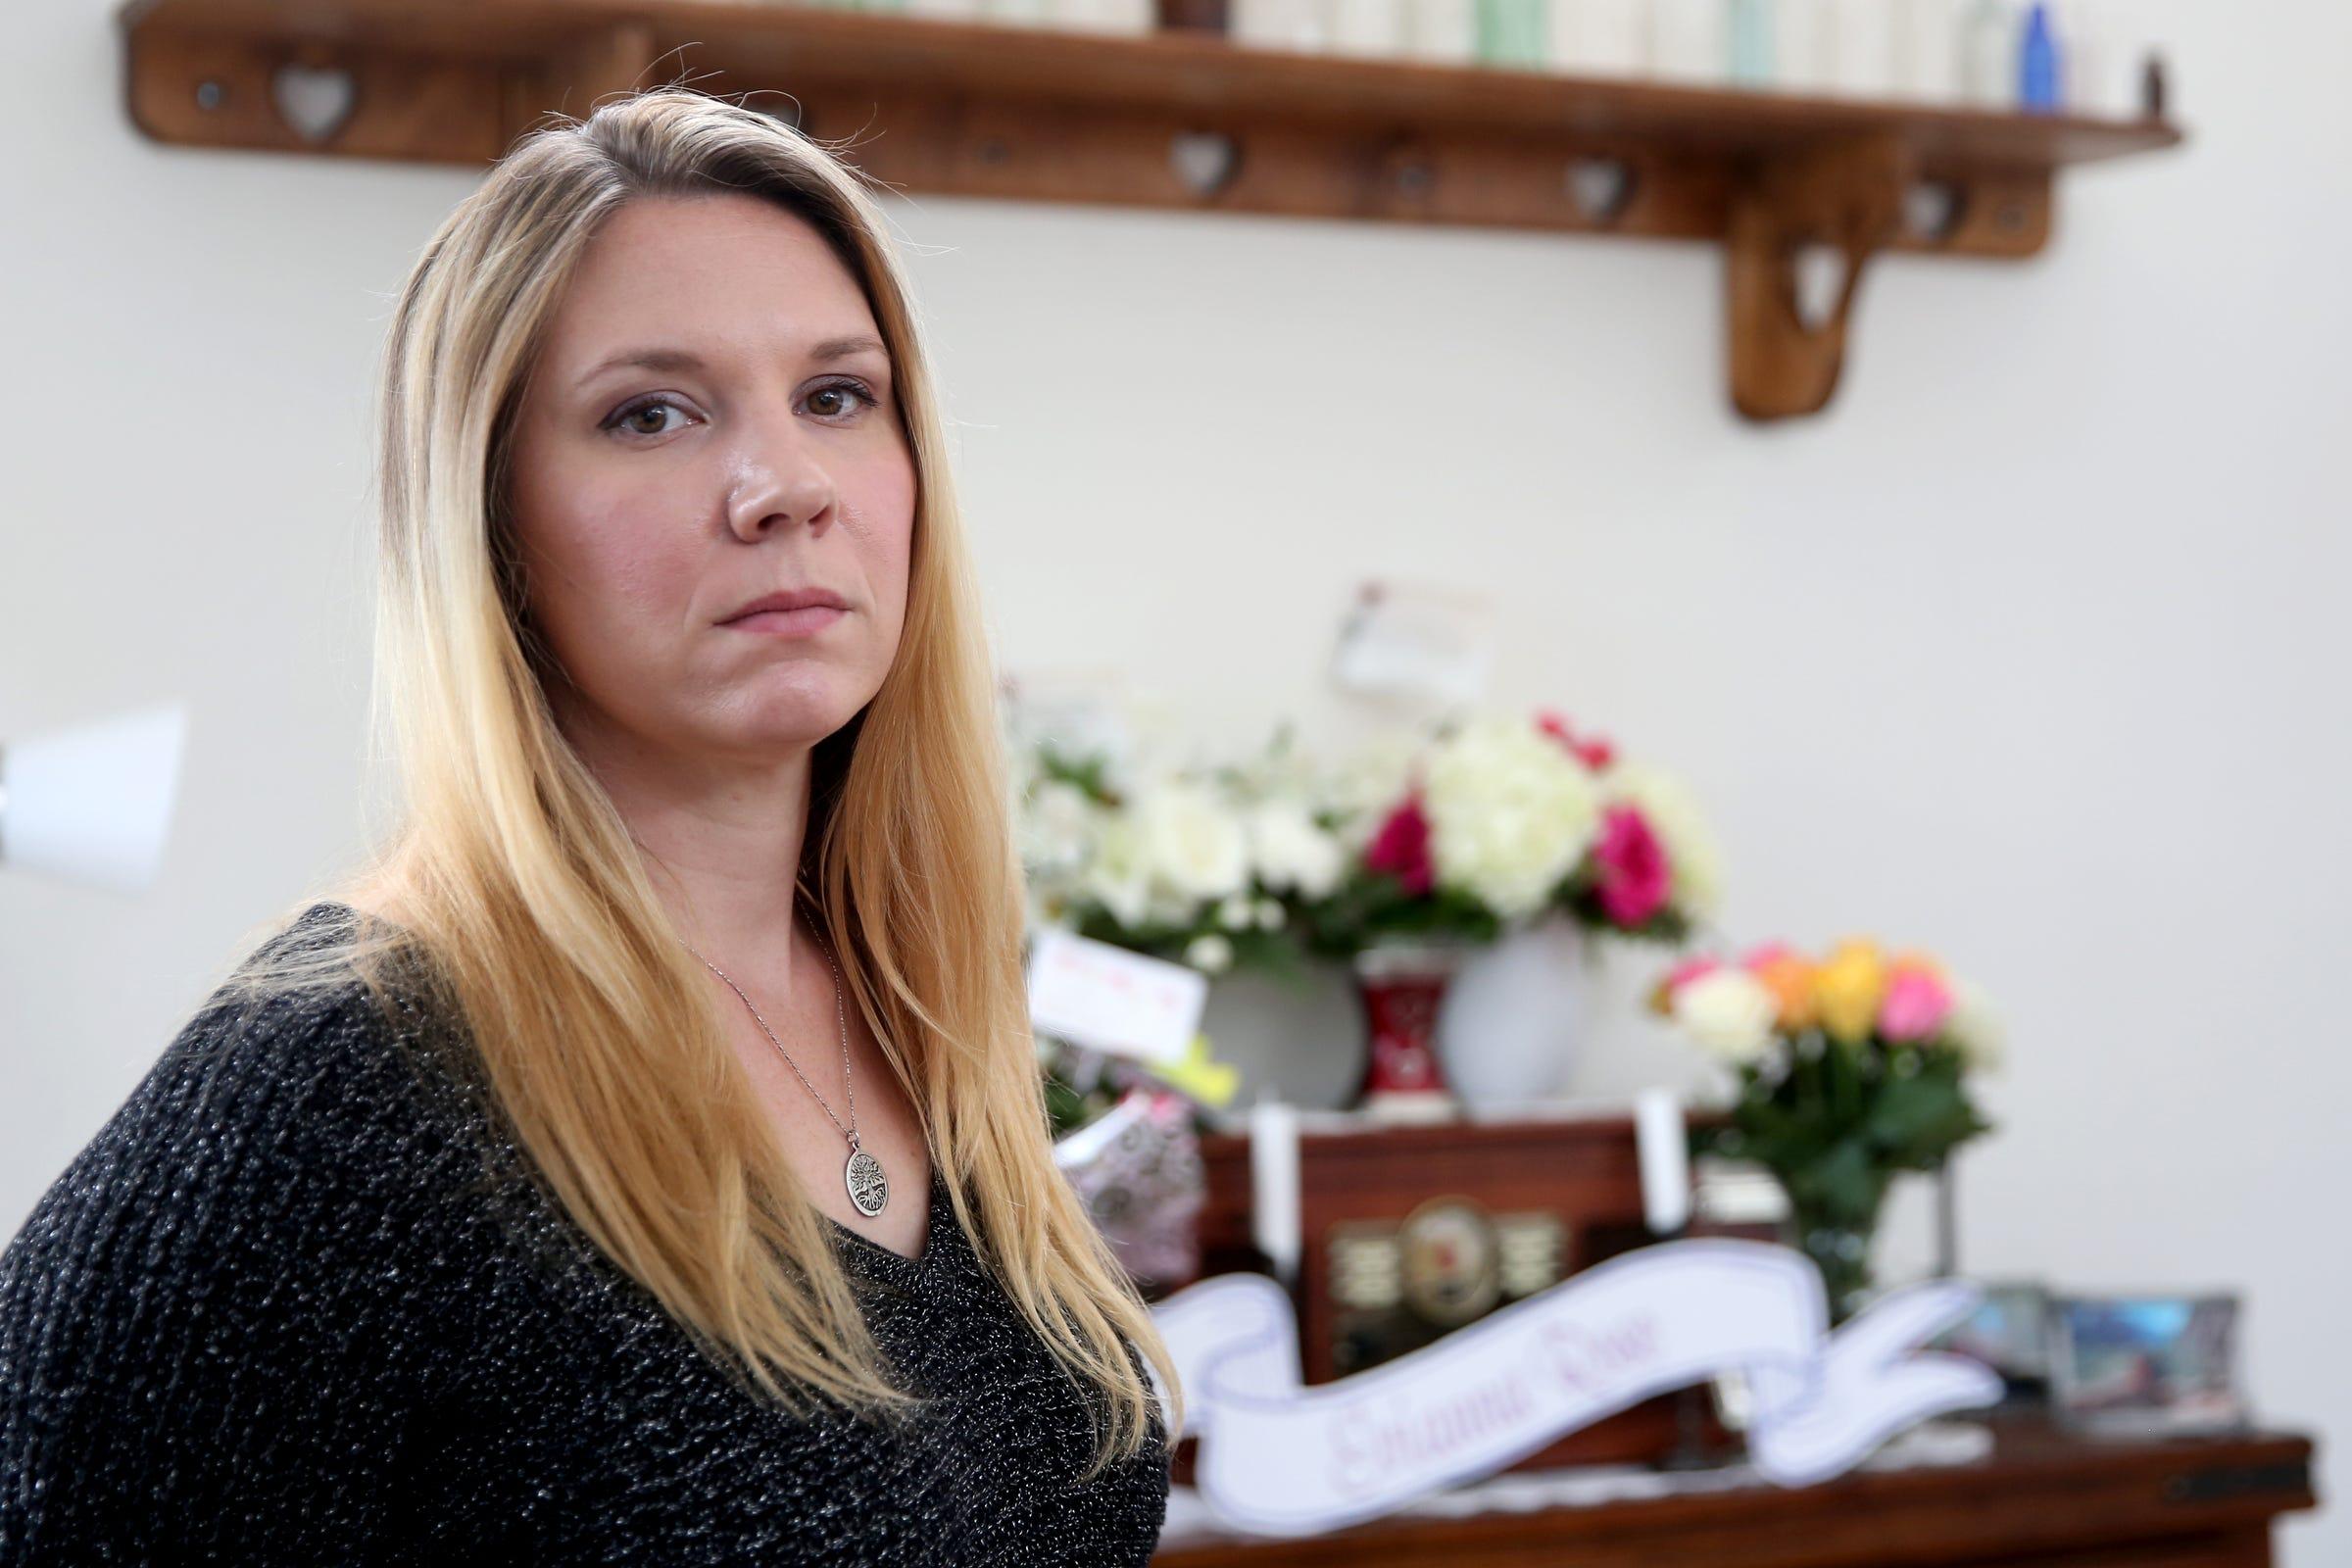 Mom questions hospital after infant's meningitis death